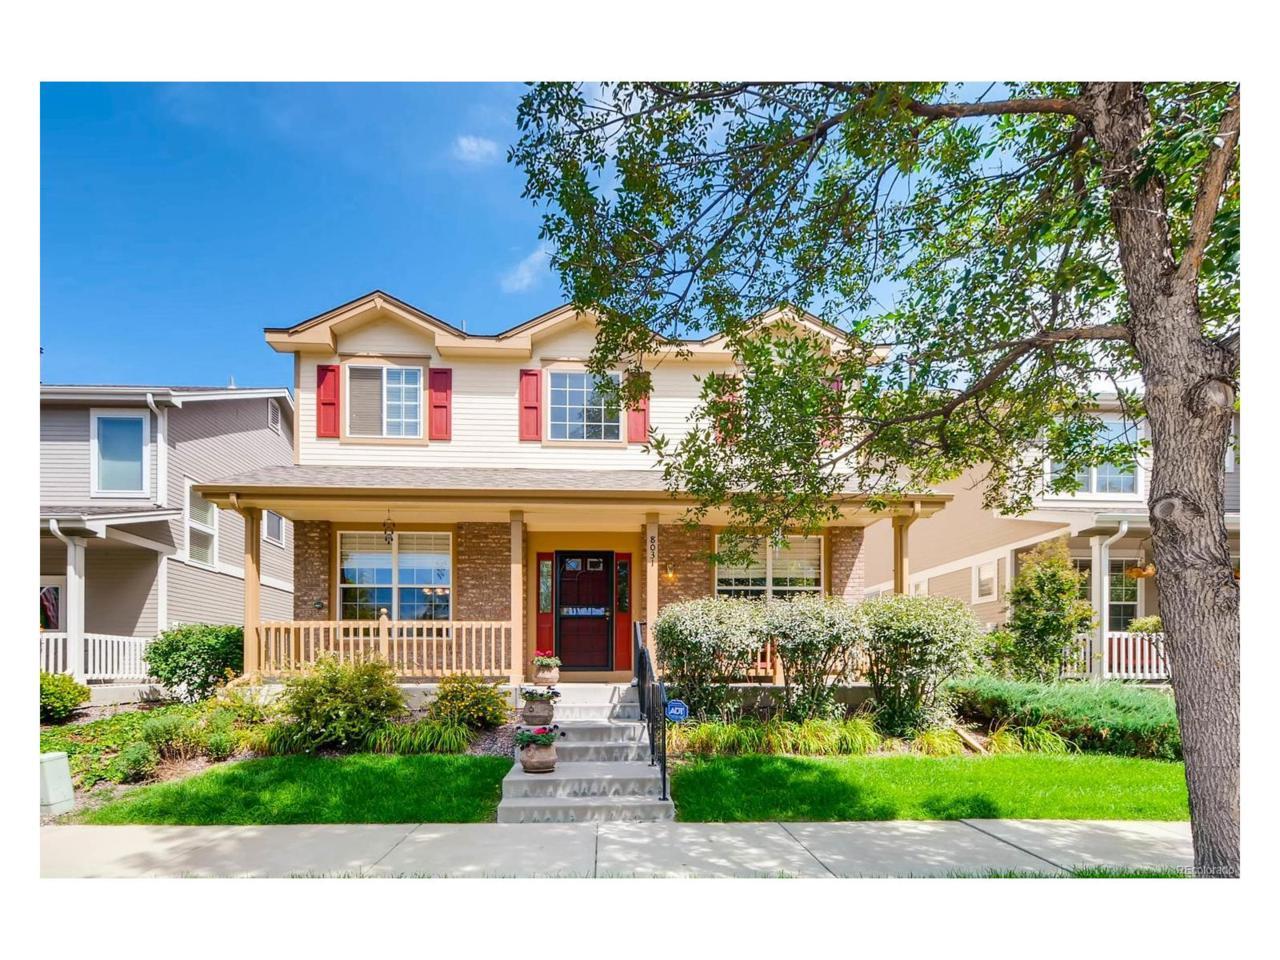 8031 E Bayaud Avenue, Denver, CO 80230 (MLS #3390080) :: 8z Real Estate